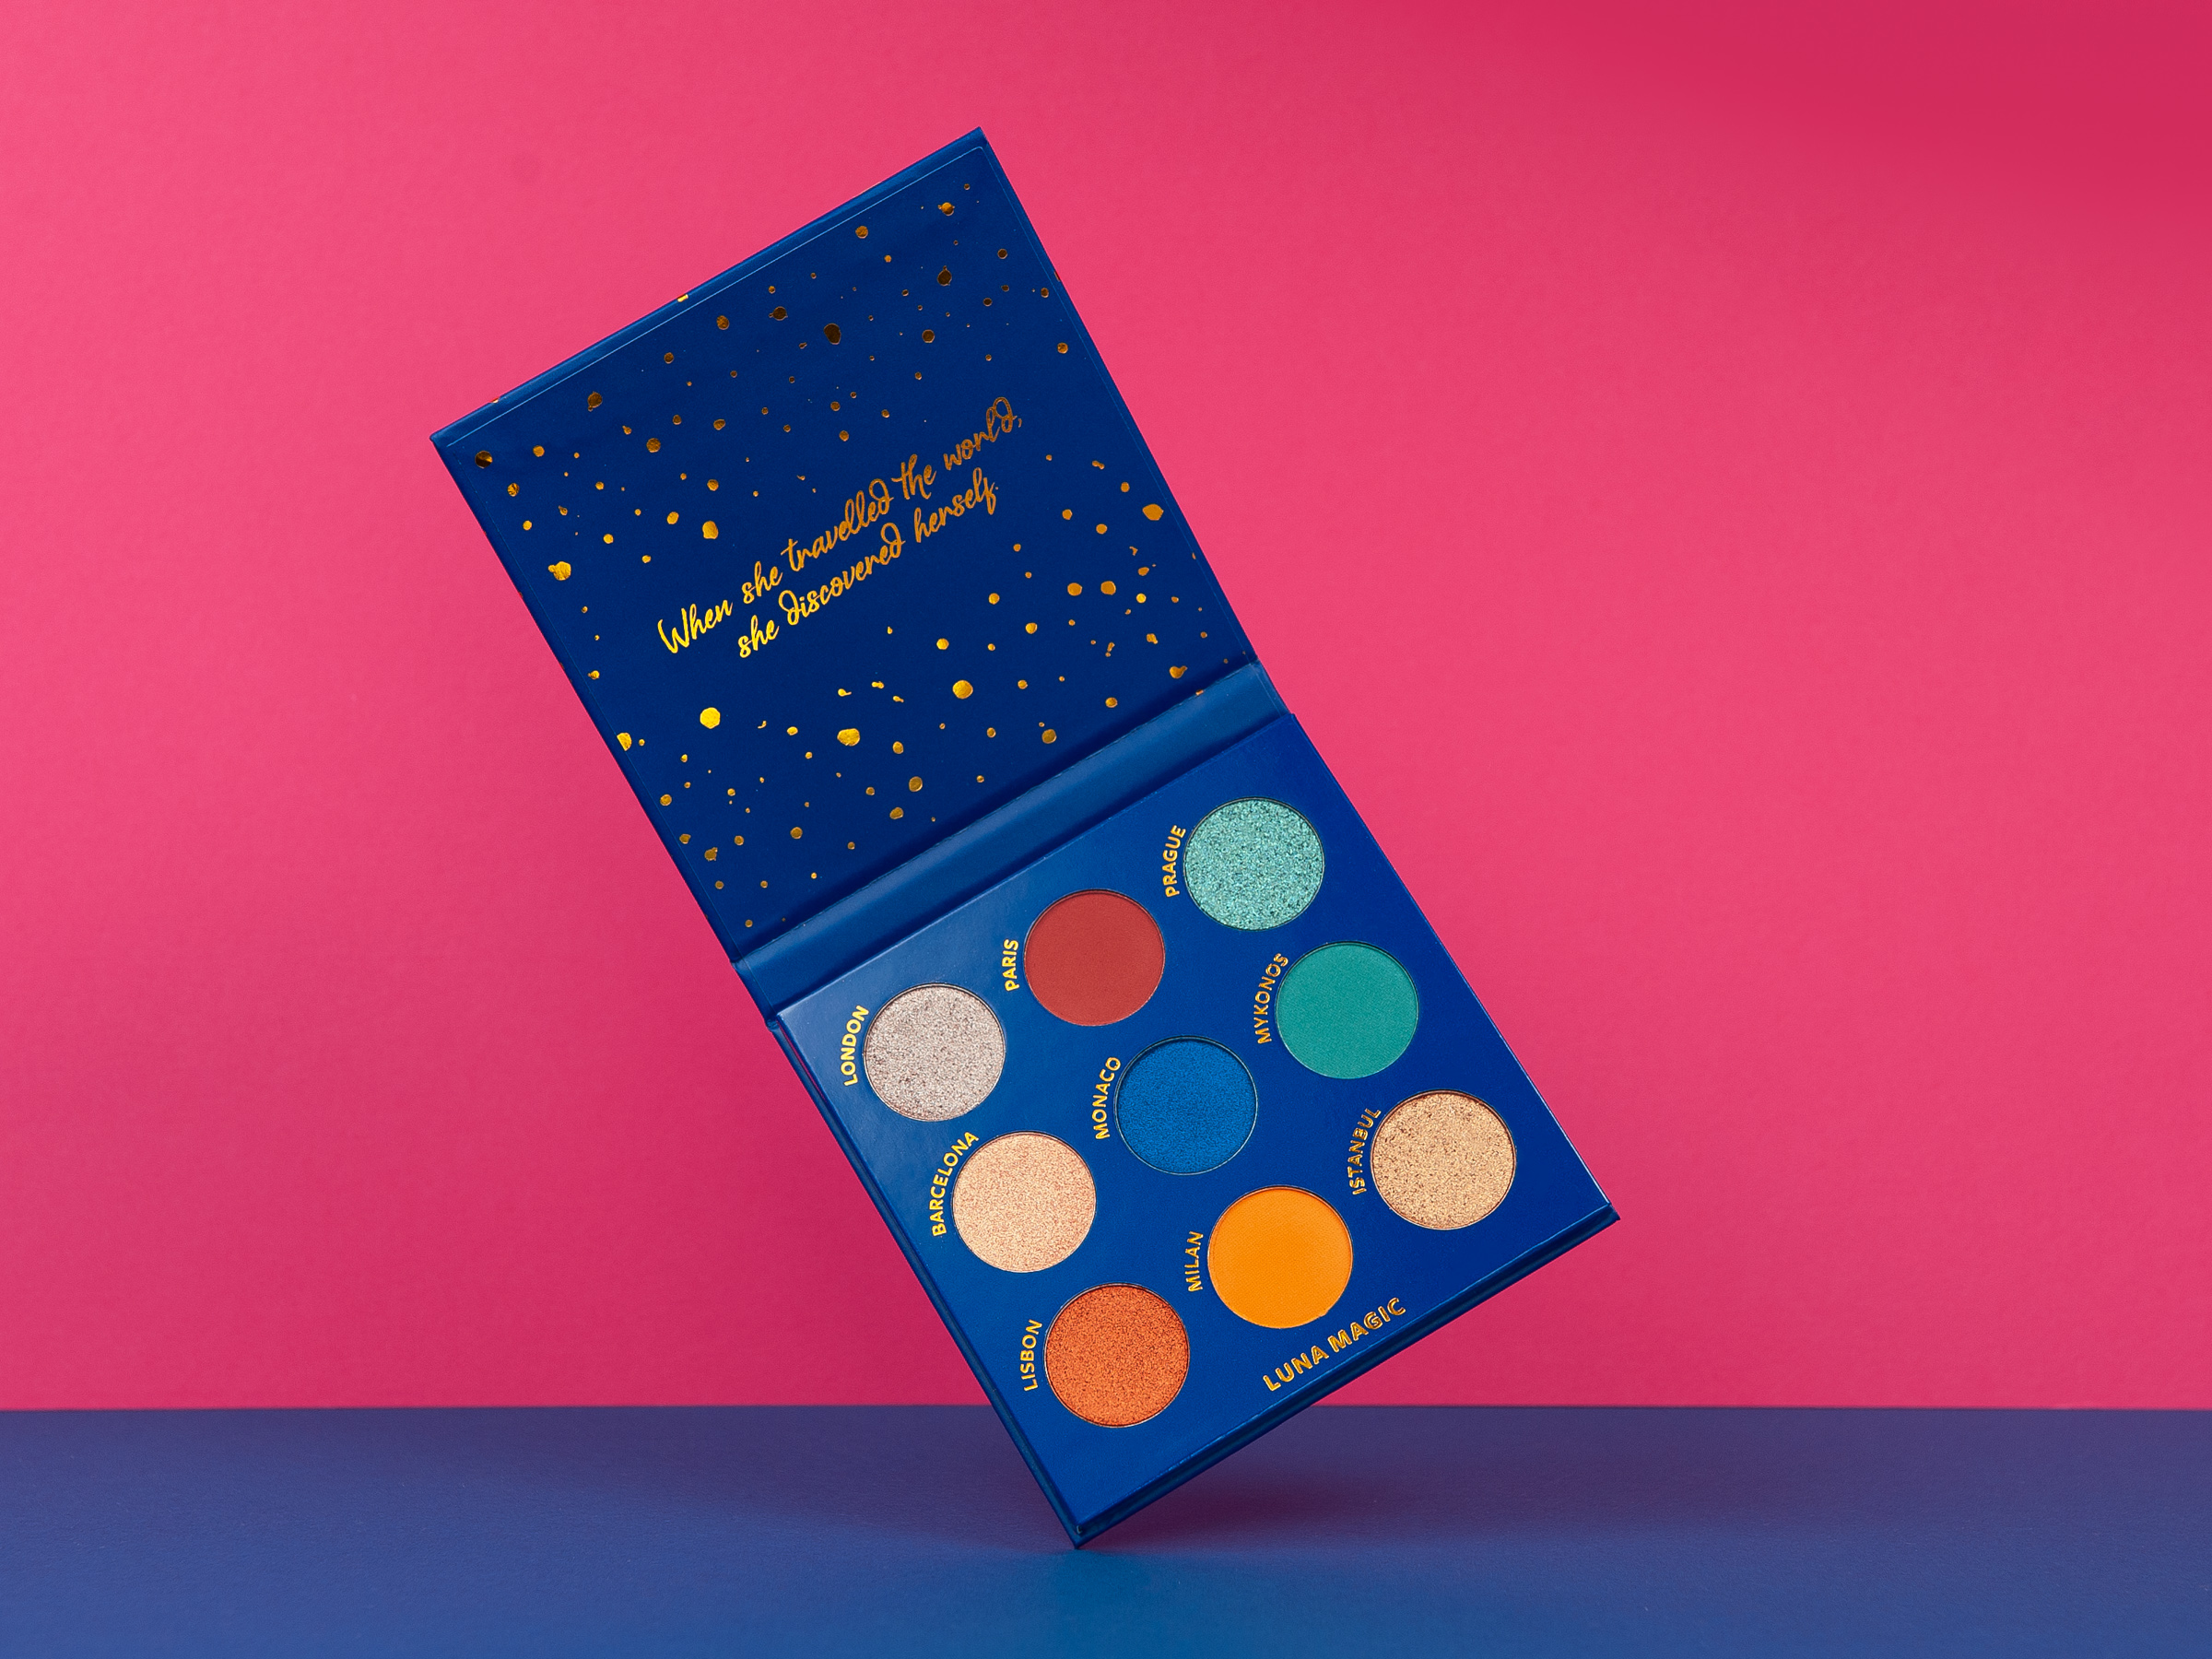 A Luna Magic Cosmopolitan eyeshadow palette on a pink background